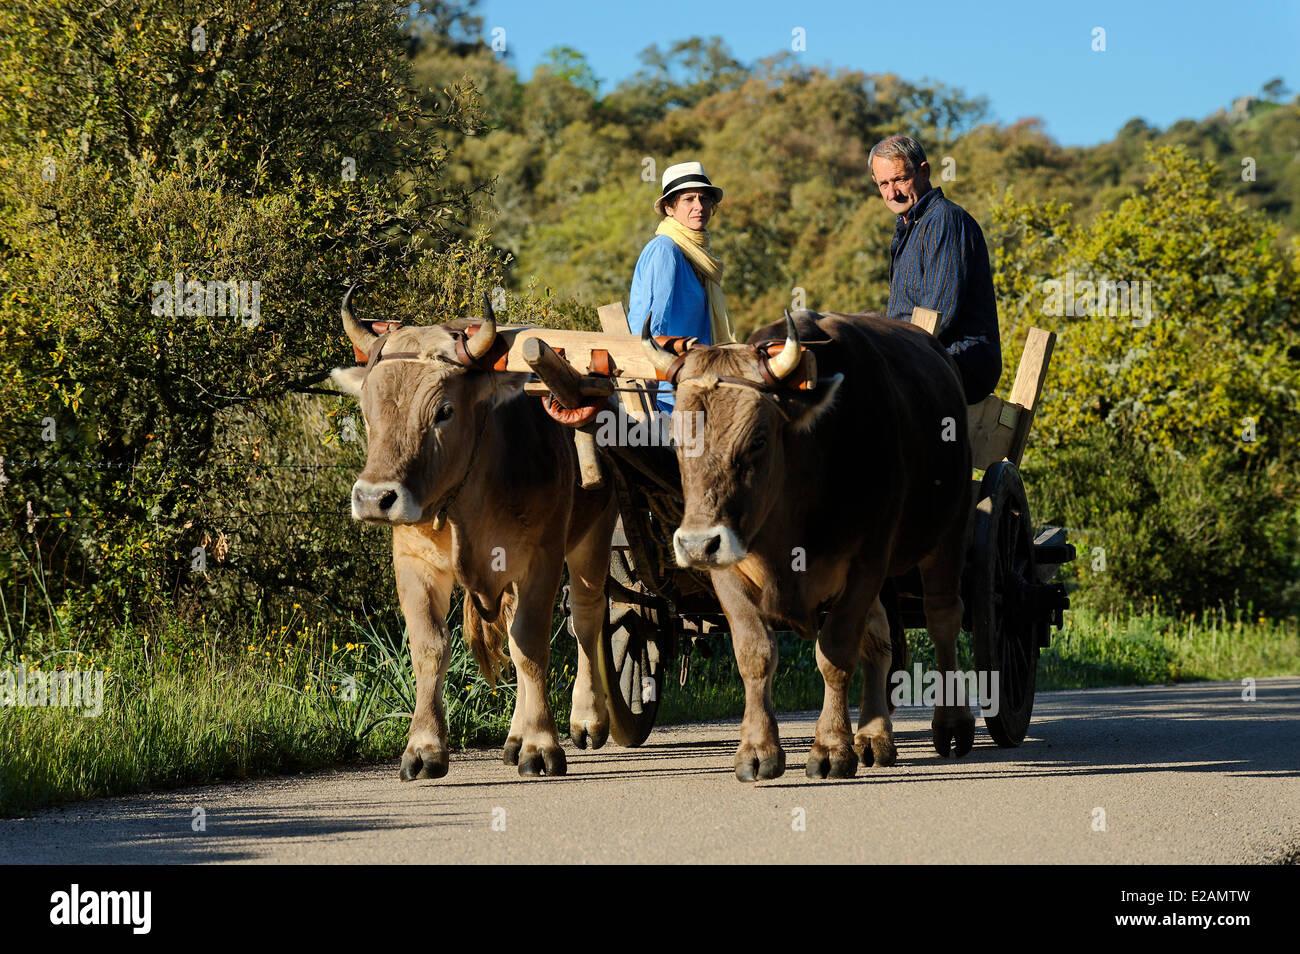 Italy, Sardinia, Olbia Tempio Province, Aggius, horse wagon pulled by a couple of beef roadside - Stock Image